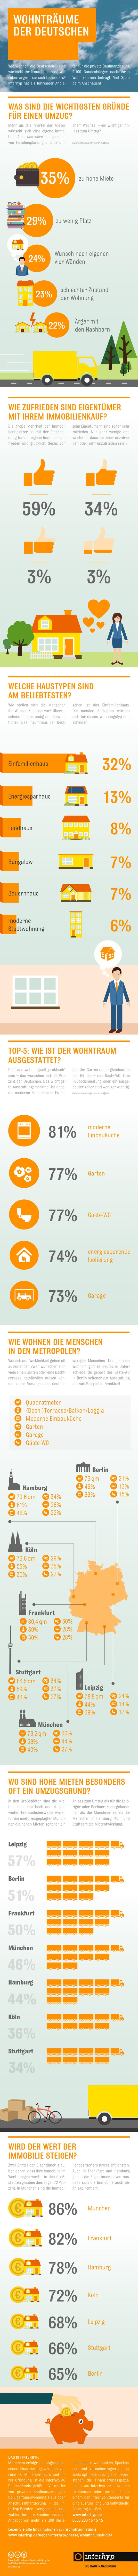 Infografik: interhyp Wohntraumstudie